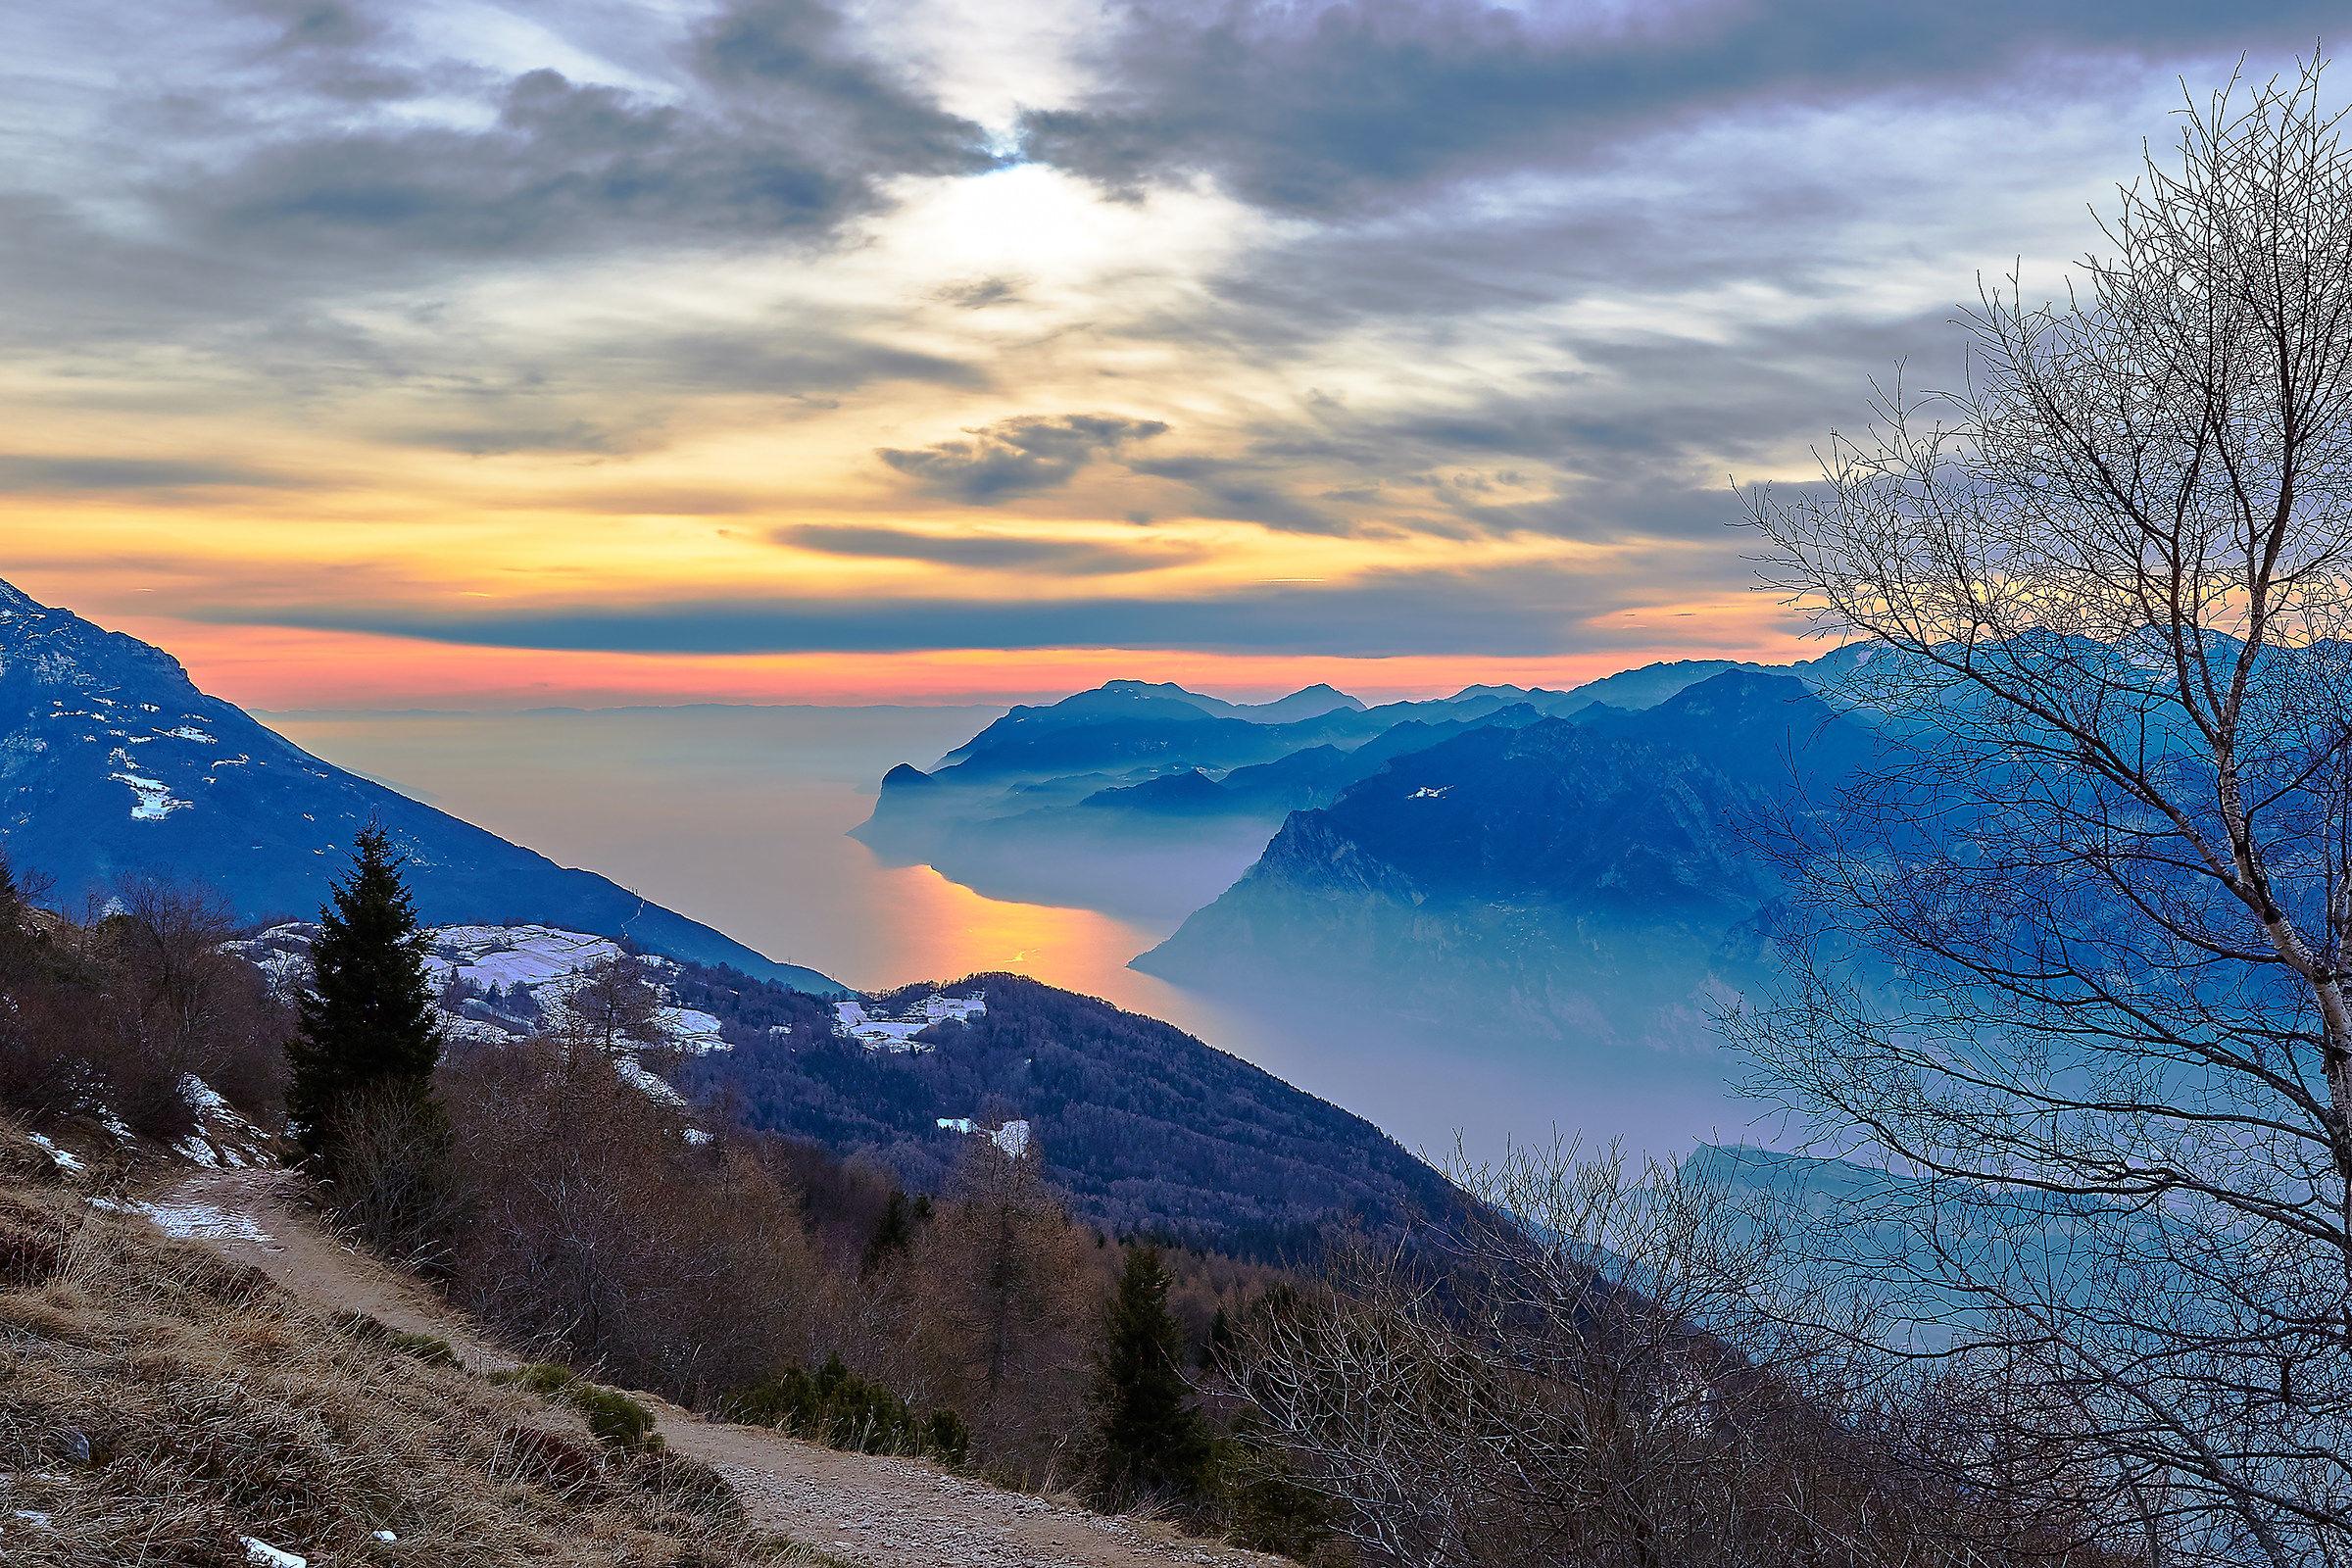 Monte Stivo-Lake Garda, Italy...